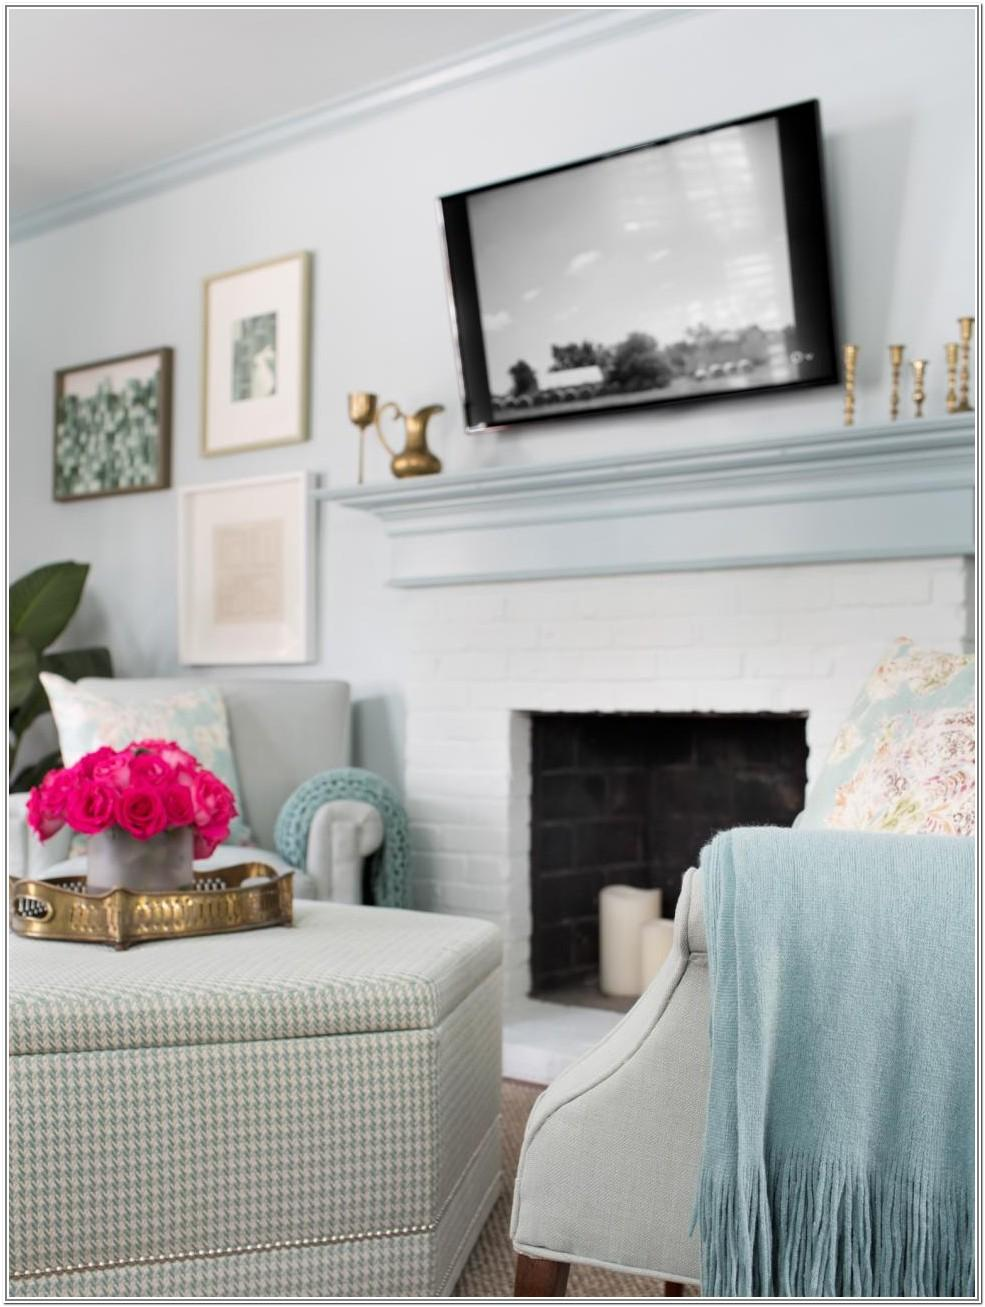 Living Room Design Ideas Small No Television